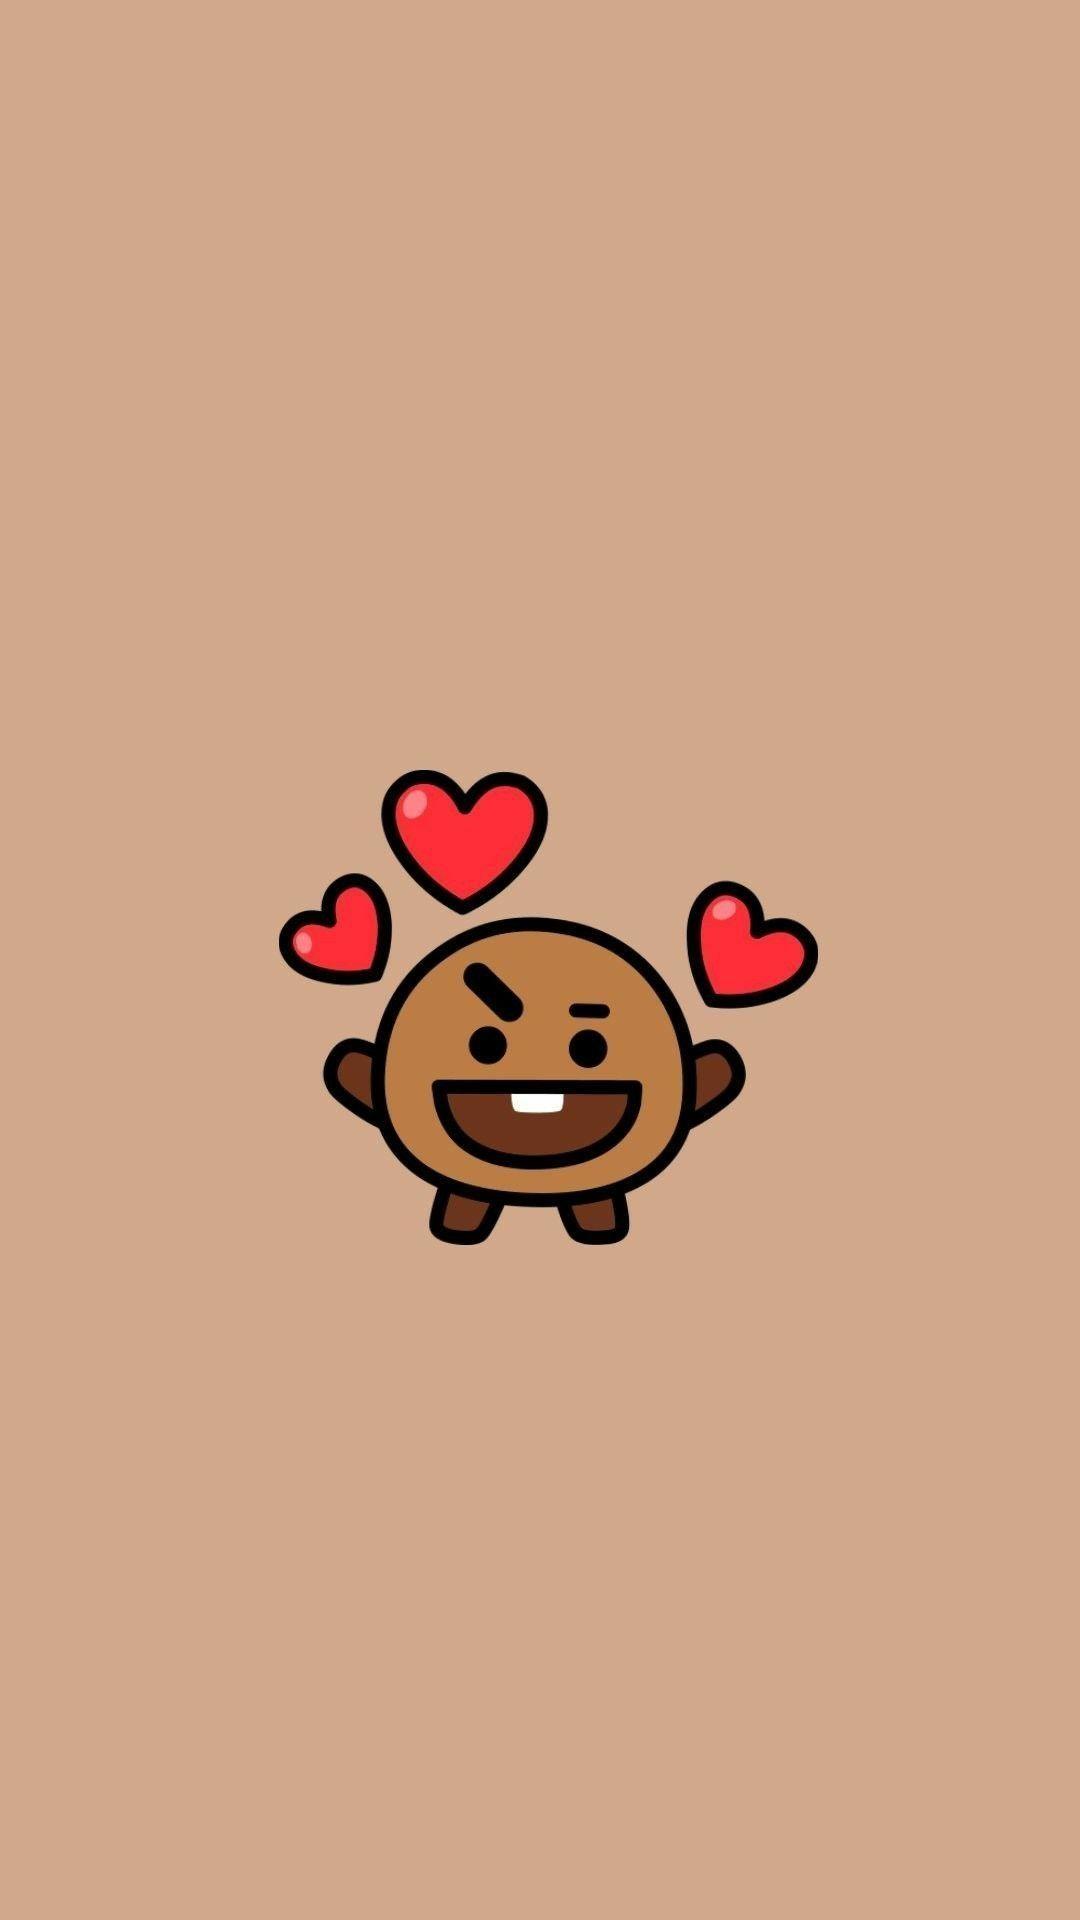 Cute Kawaii Wallpapers Note 20 Iphone 12 Wallpaper Kawaii Kartu Lucu Gambar Lucu